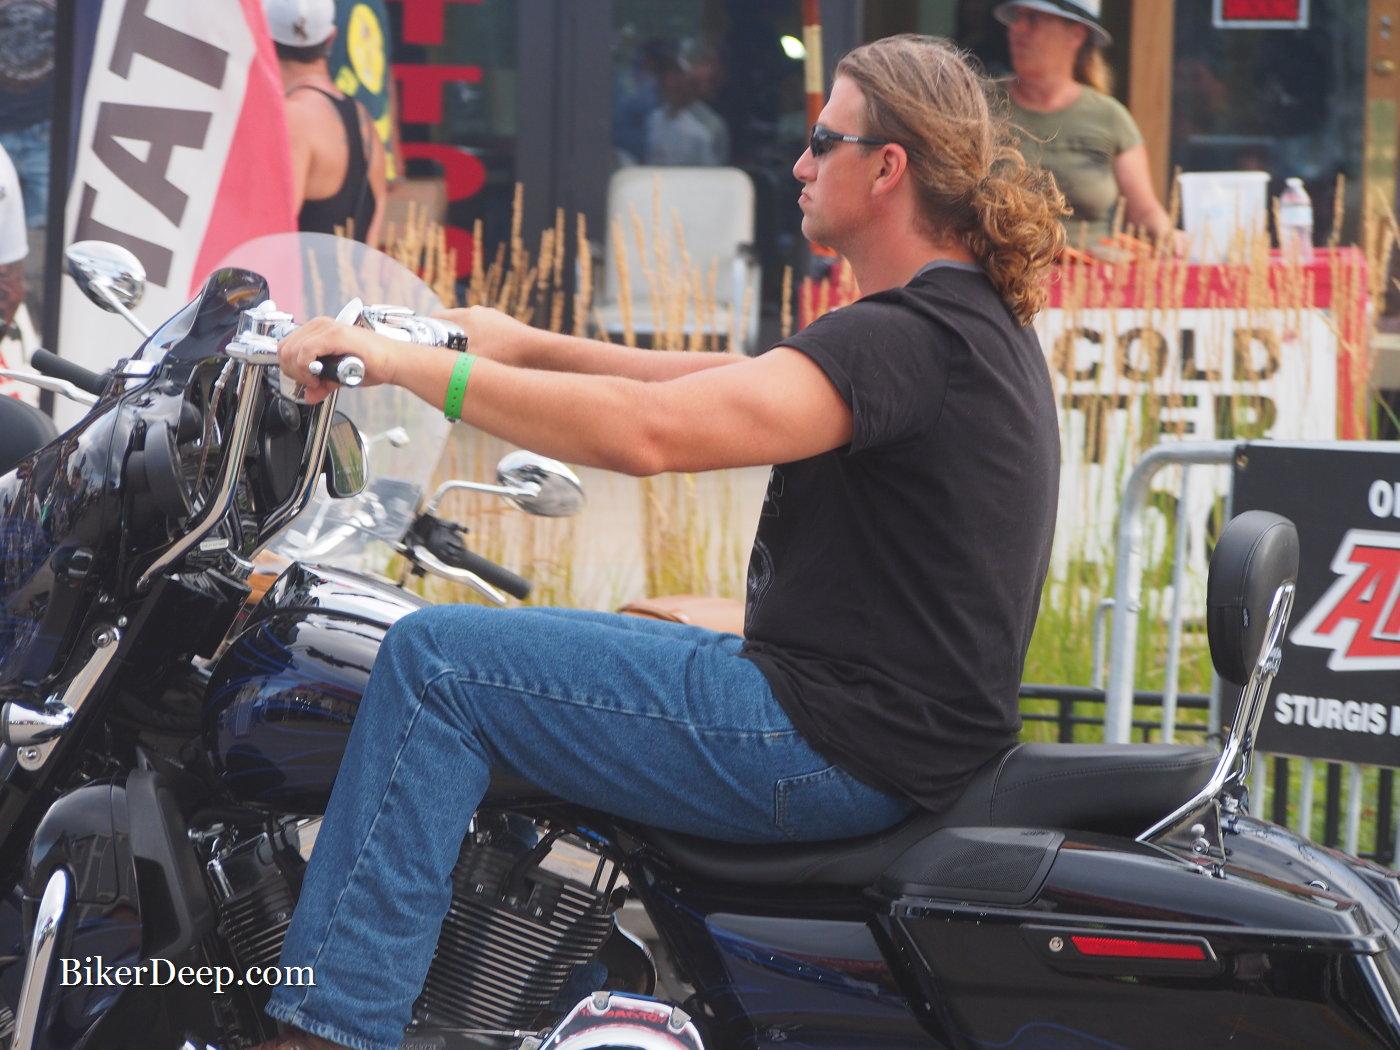 Ponytail Rider